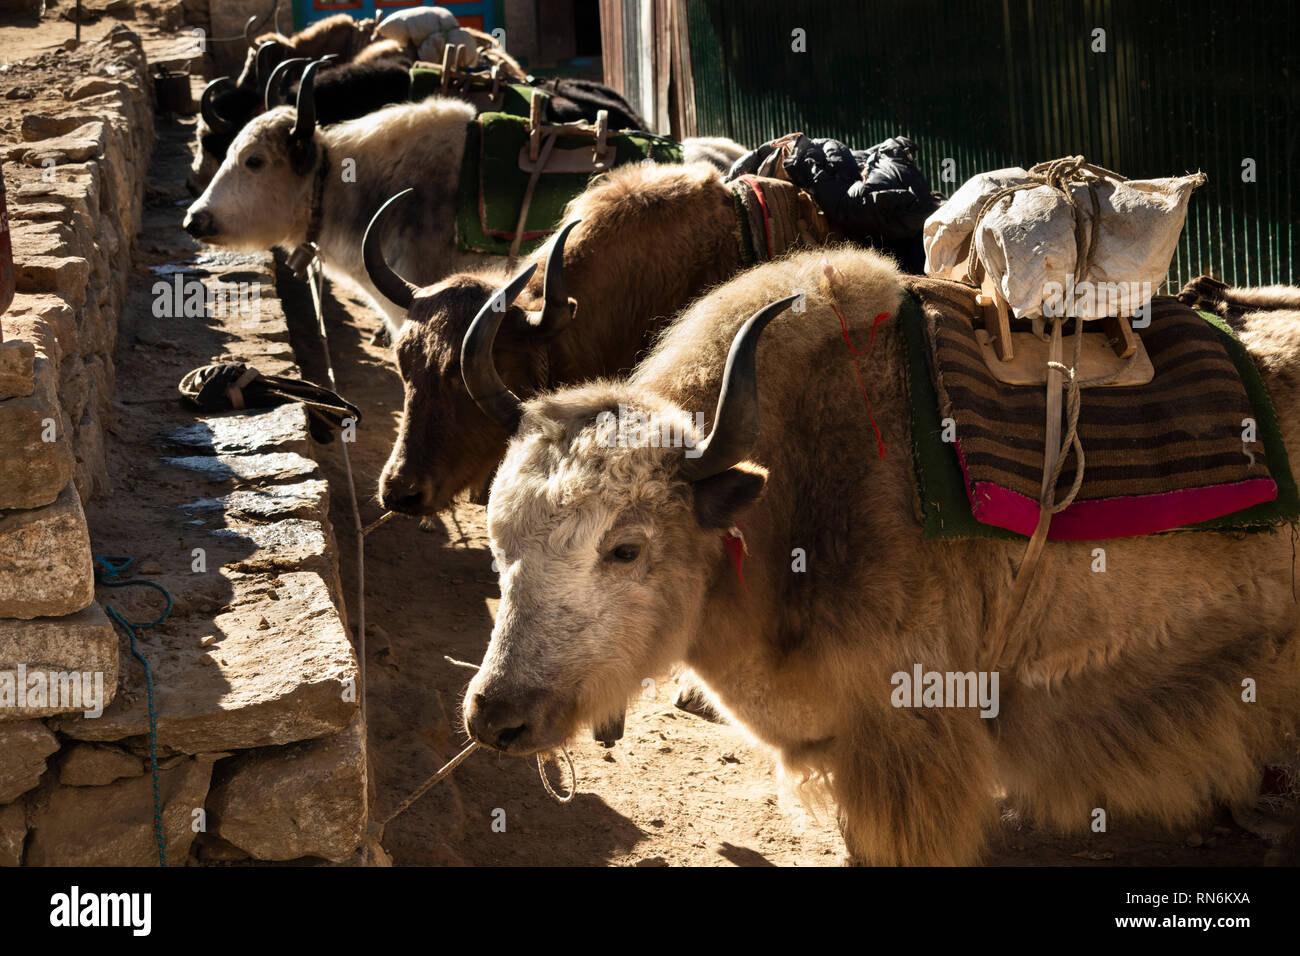 Nepal, Namche Bazaar, Market, Yaks used as pack animals to transport goods in mountainous Khumbu region - Stock Image